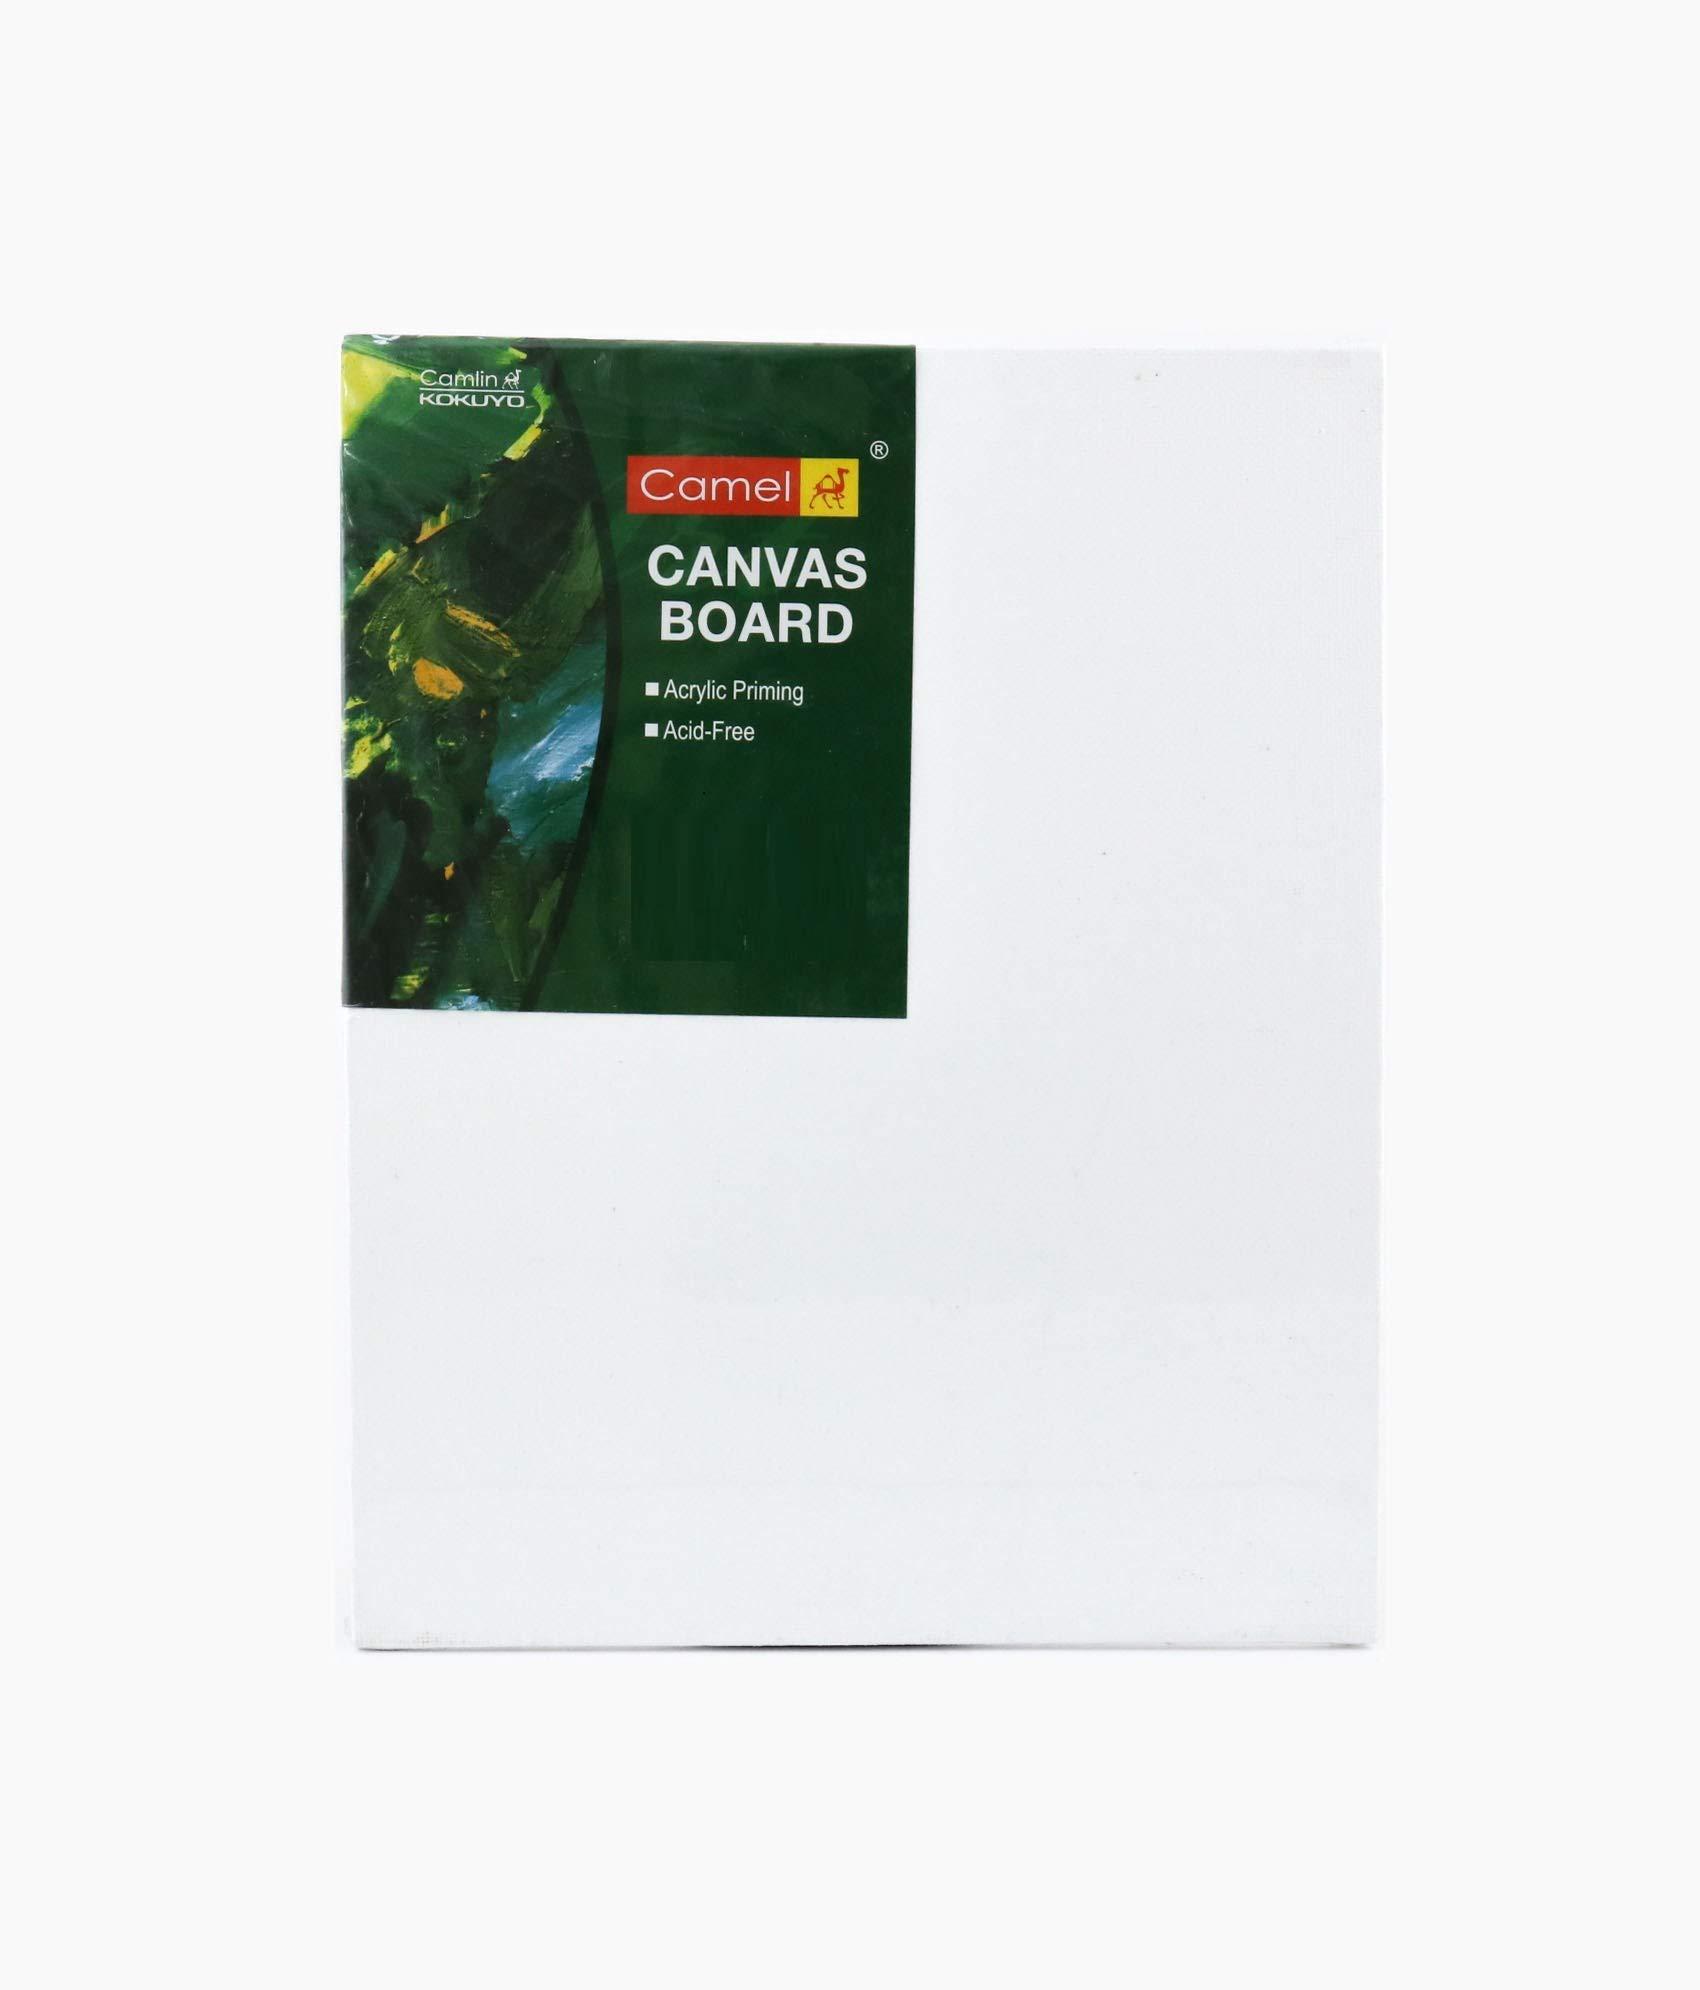 Camel Kokuyo Canvas Board - 25cm x 30cm product image